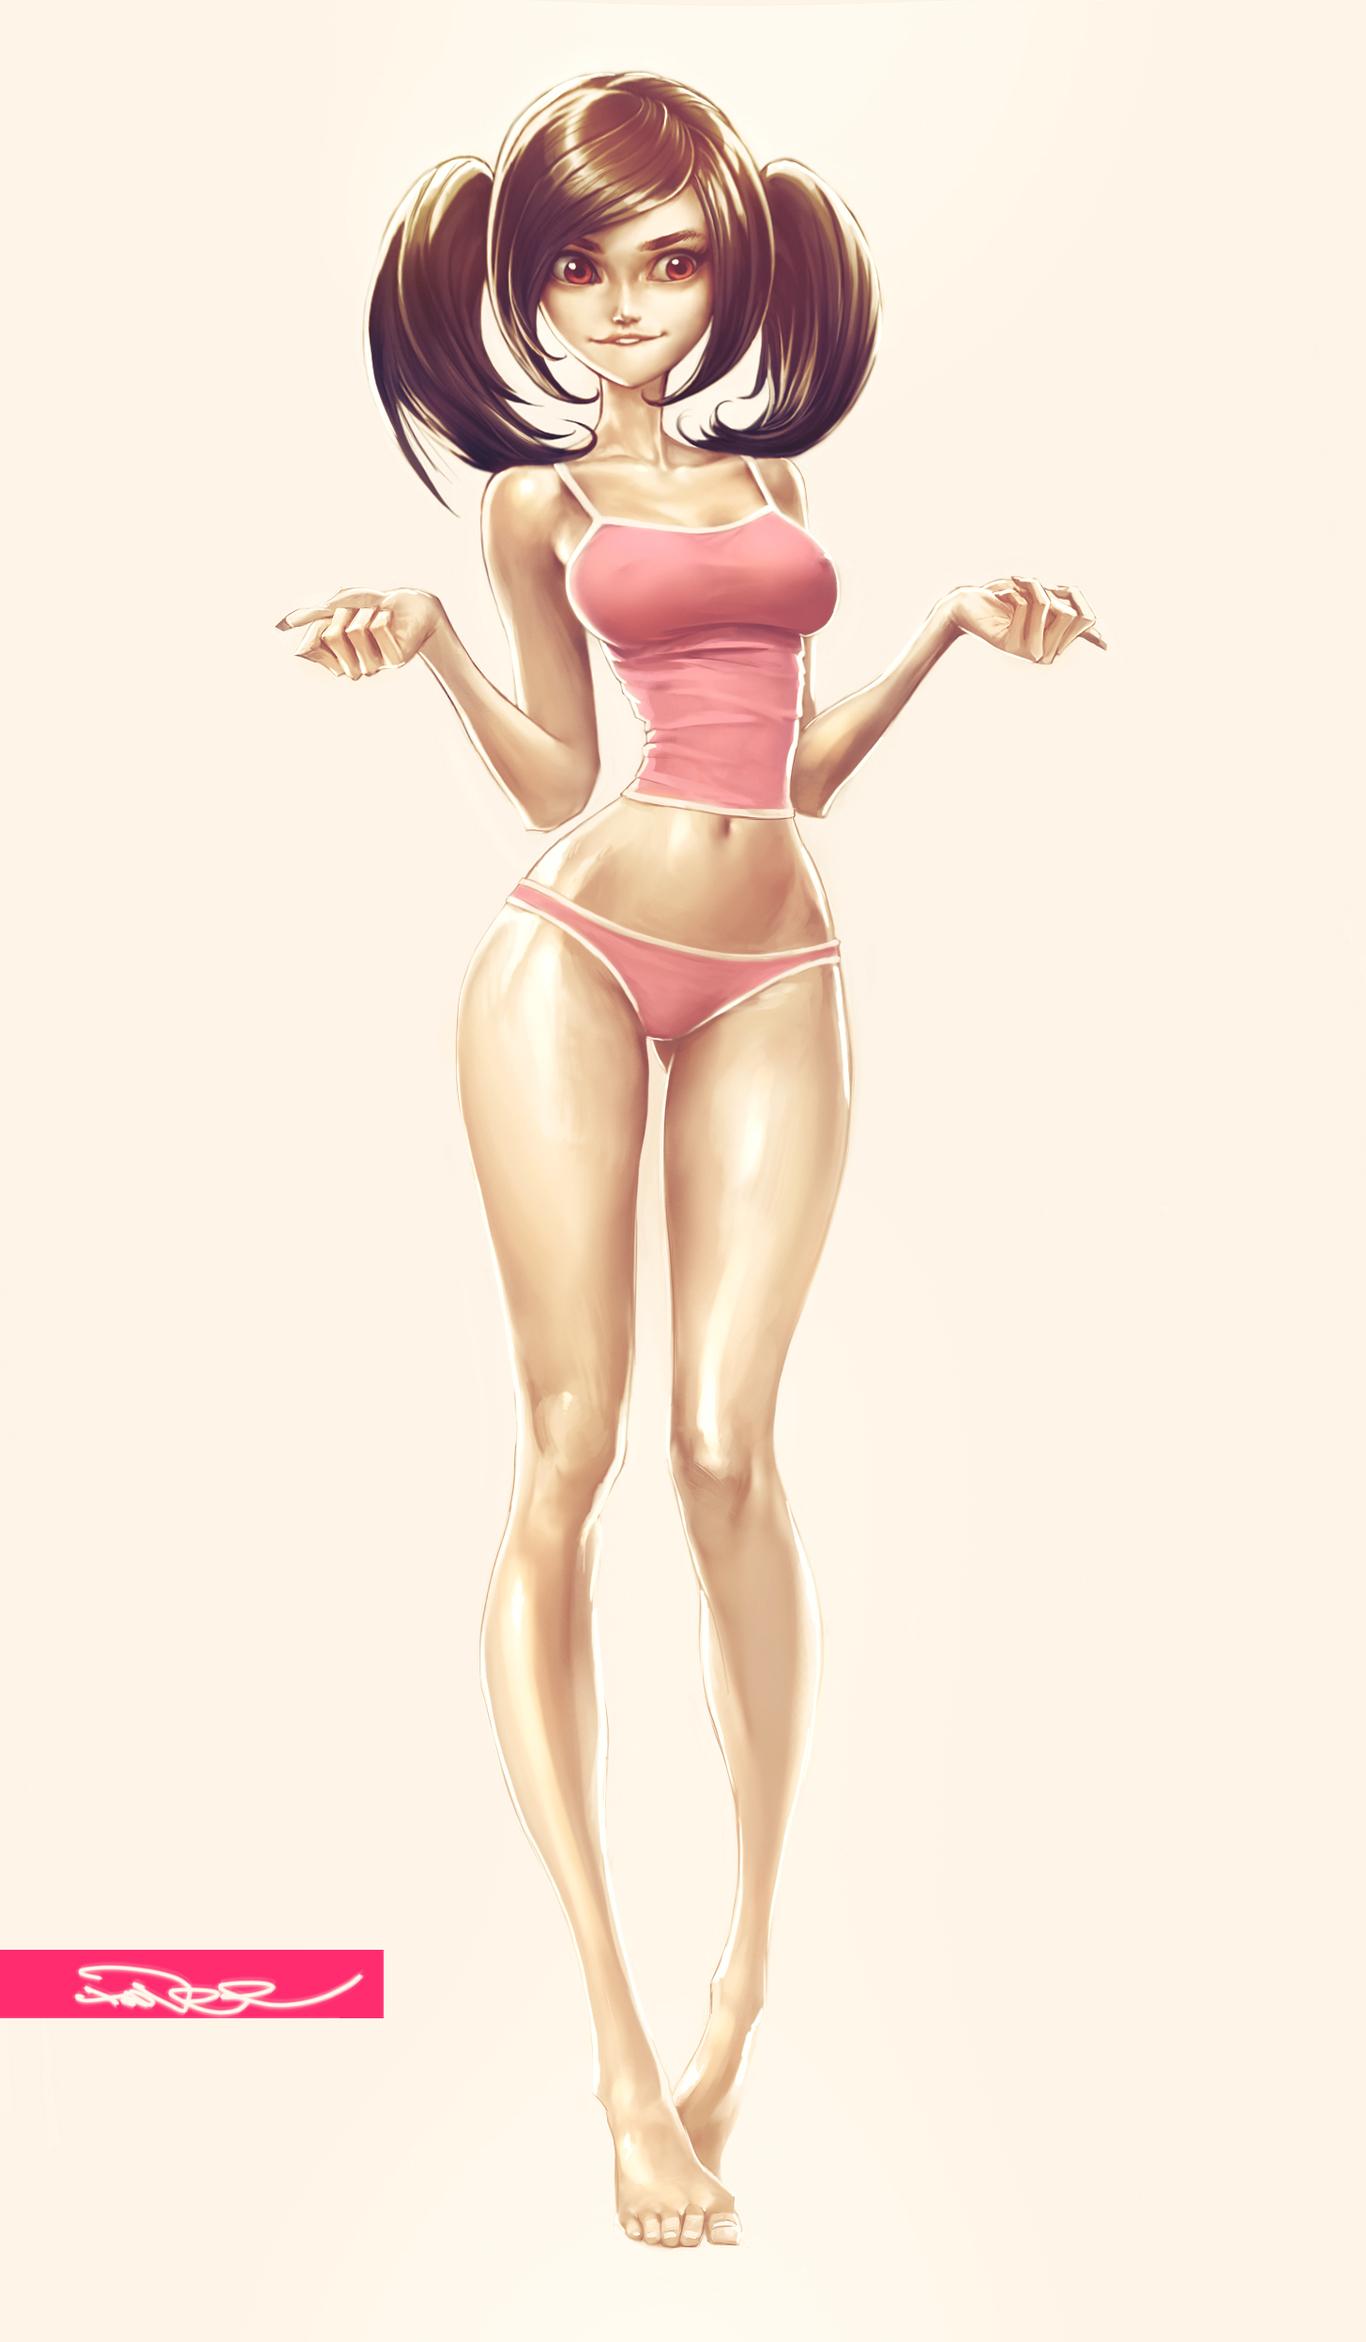 Sexy young girl cartoons — 5